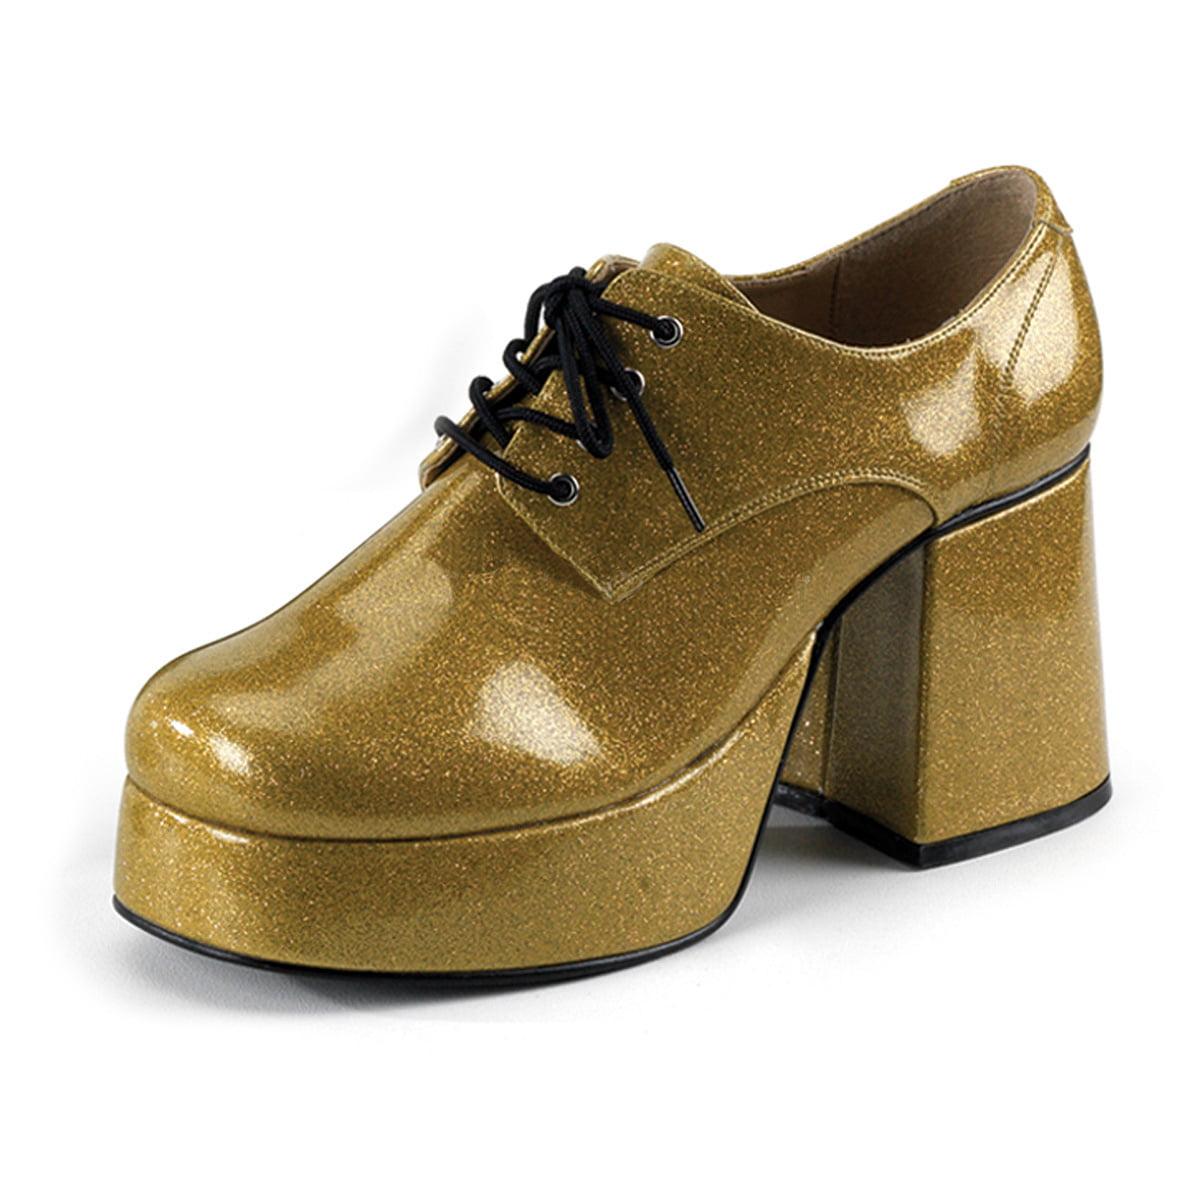 mens platform shoes gold glitter disco shoes 3 1 2 inch